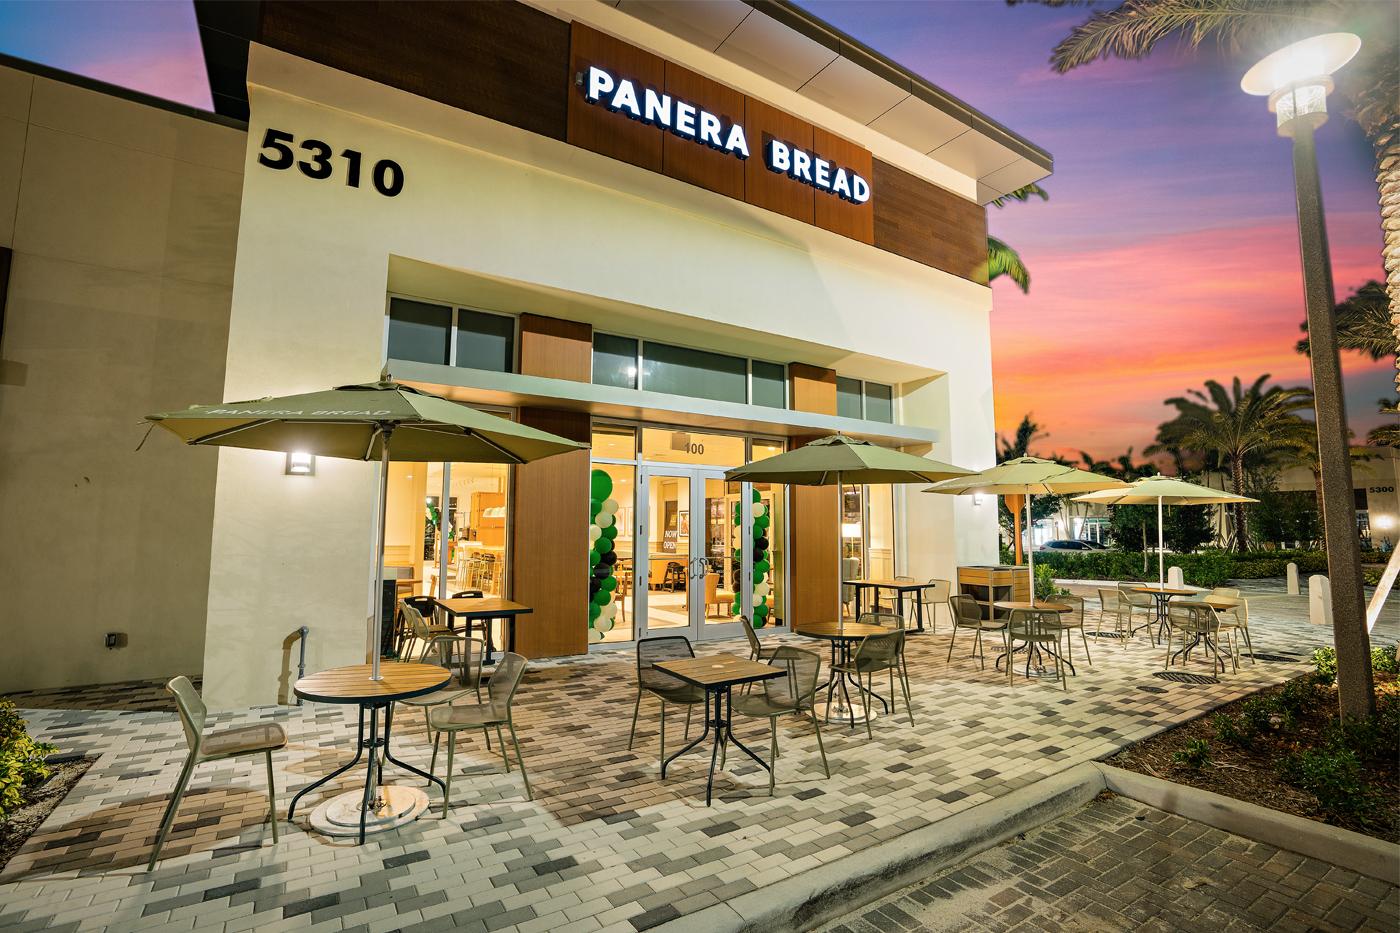 Panera-bread-3